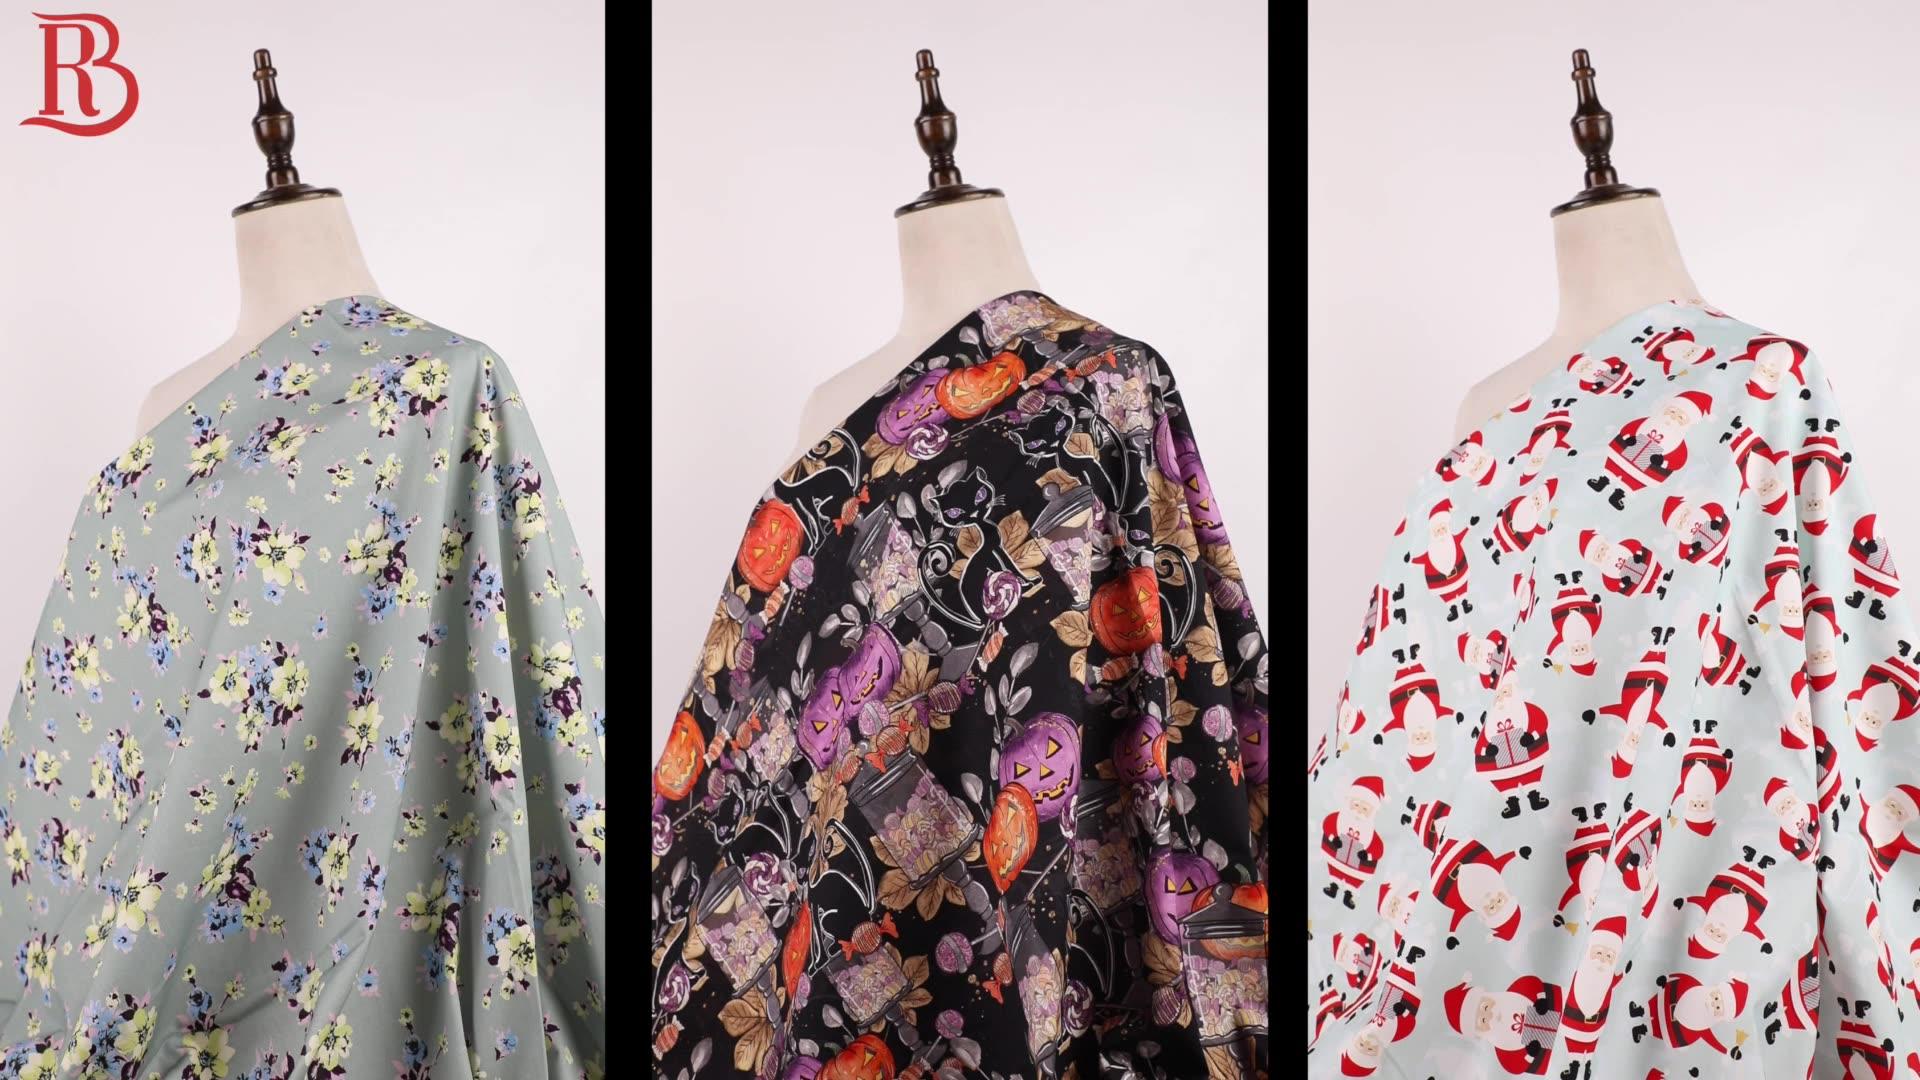 Good 32S * 32Sทอหุ้นจำนวนมากสีชมพูพิมพ์ดอกไม้และผ้าผ้าฝ้ายสำหรับชุด